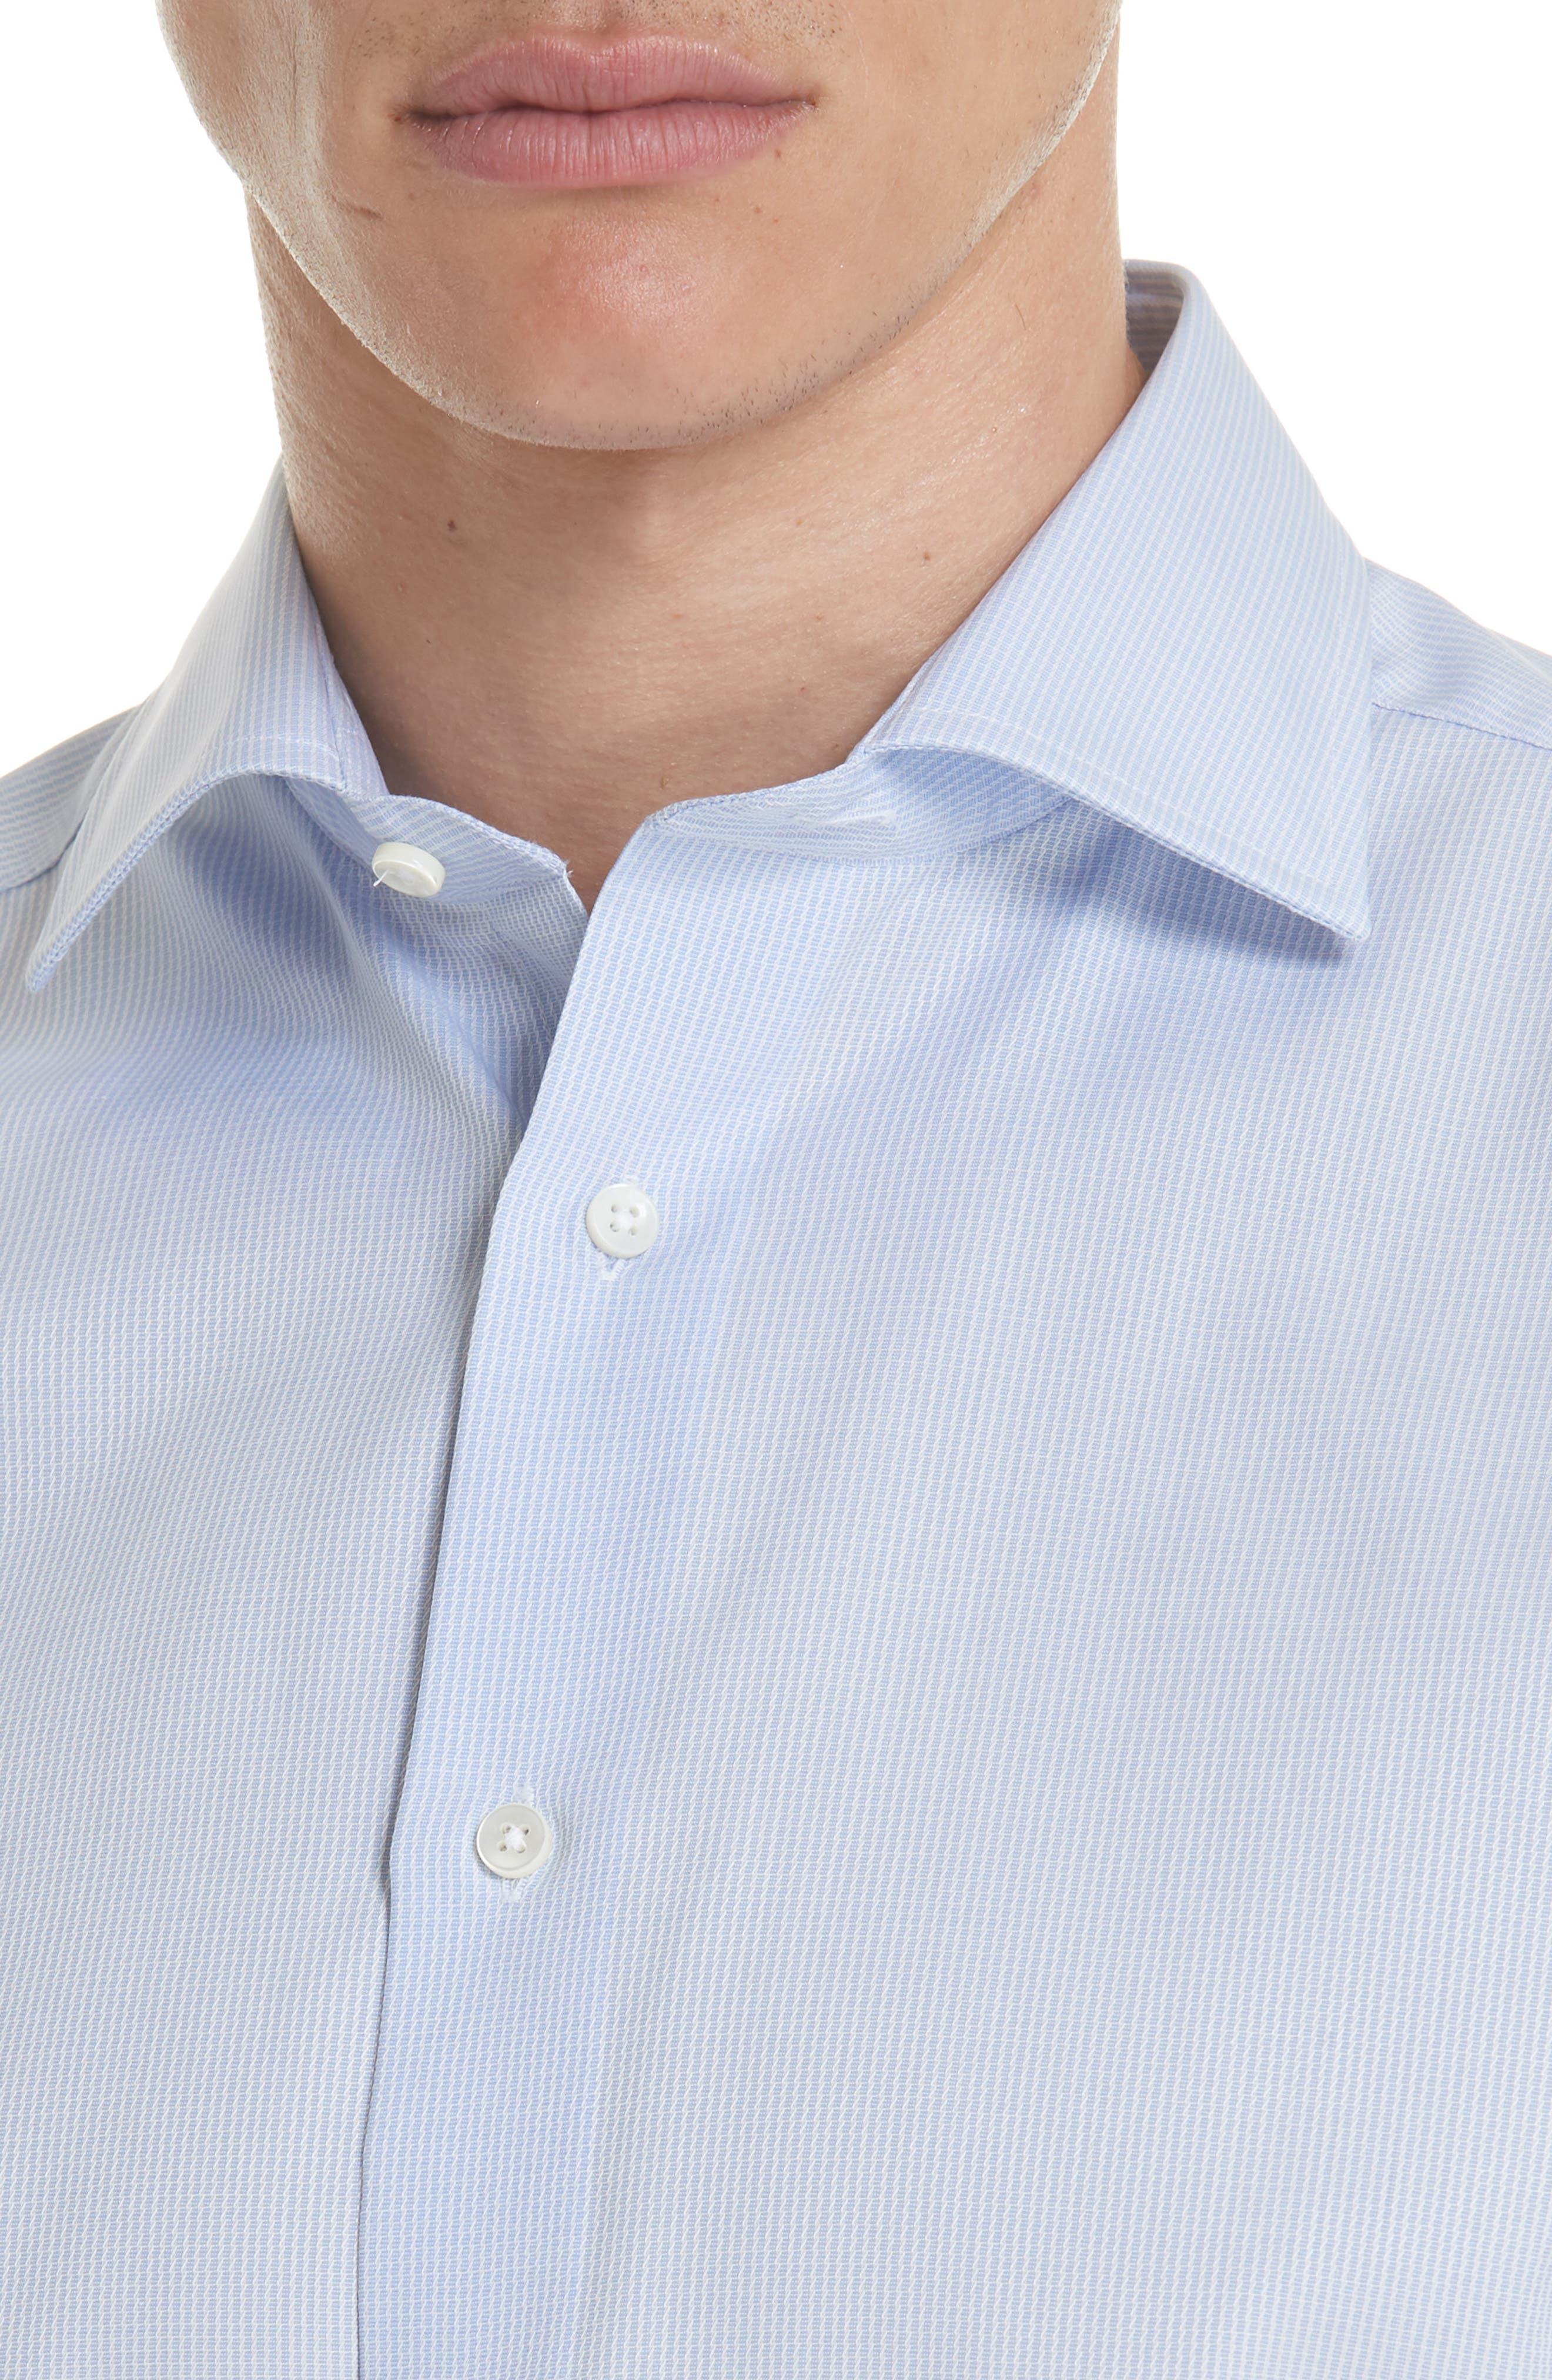 Regular Fit Print Dress Shirt,                             Alternate thumbnail 2, color,                             400